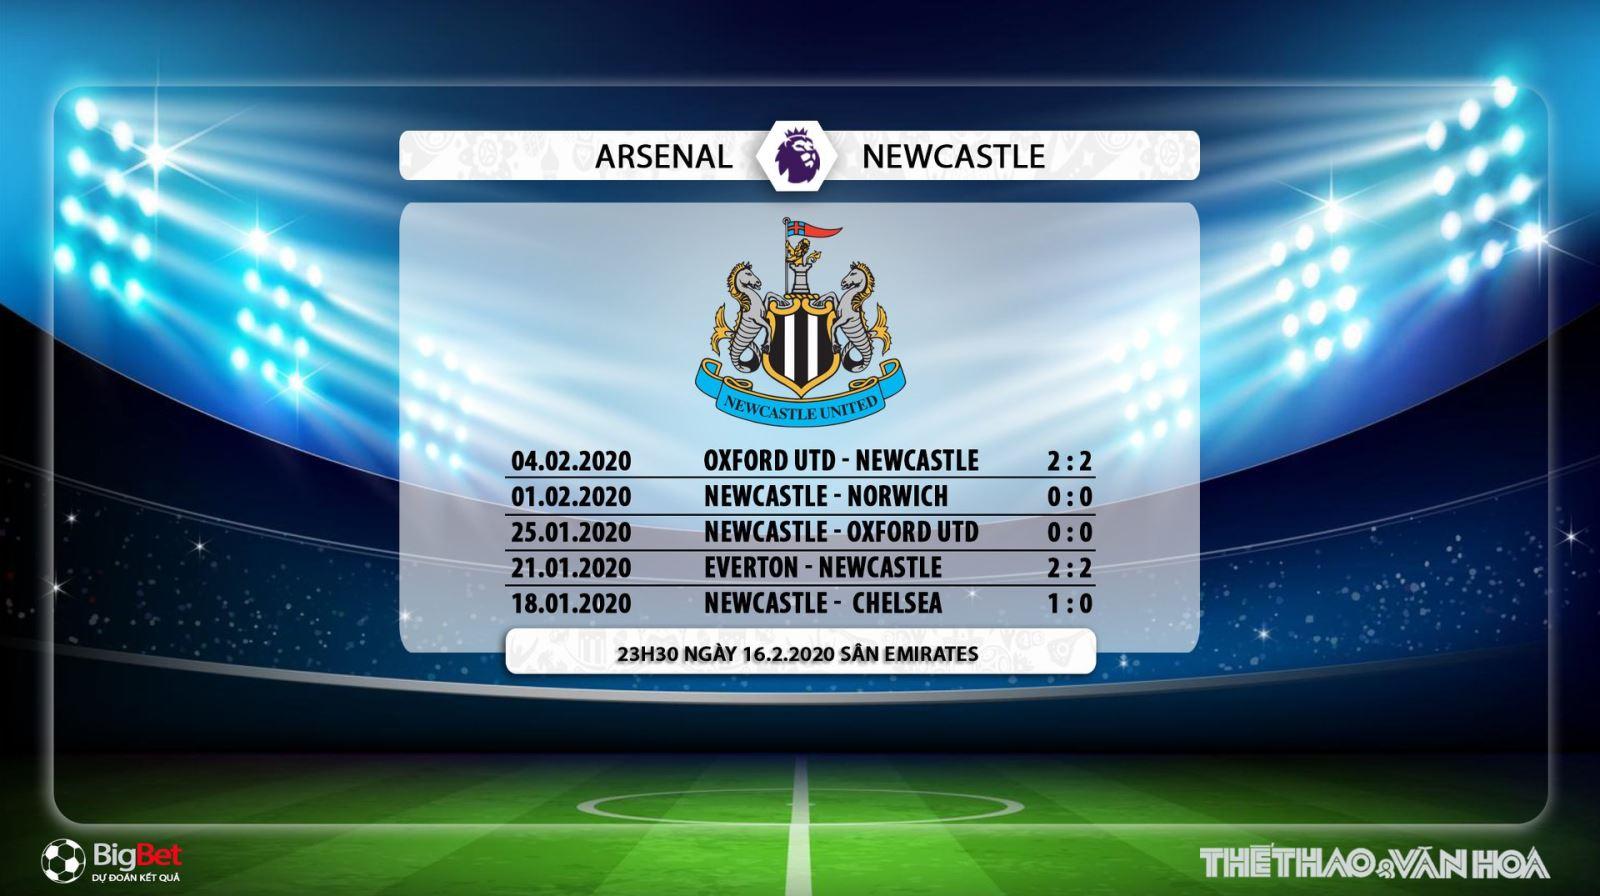 Soi kèo Arsenal vs Newcastle, Arsenal, Newcastle, trực tiếp Arsenal vs Newcastle, nhận định Arsenal vs Newcastle, bong da, bóng đá, K+, K+PM